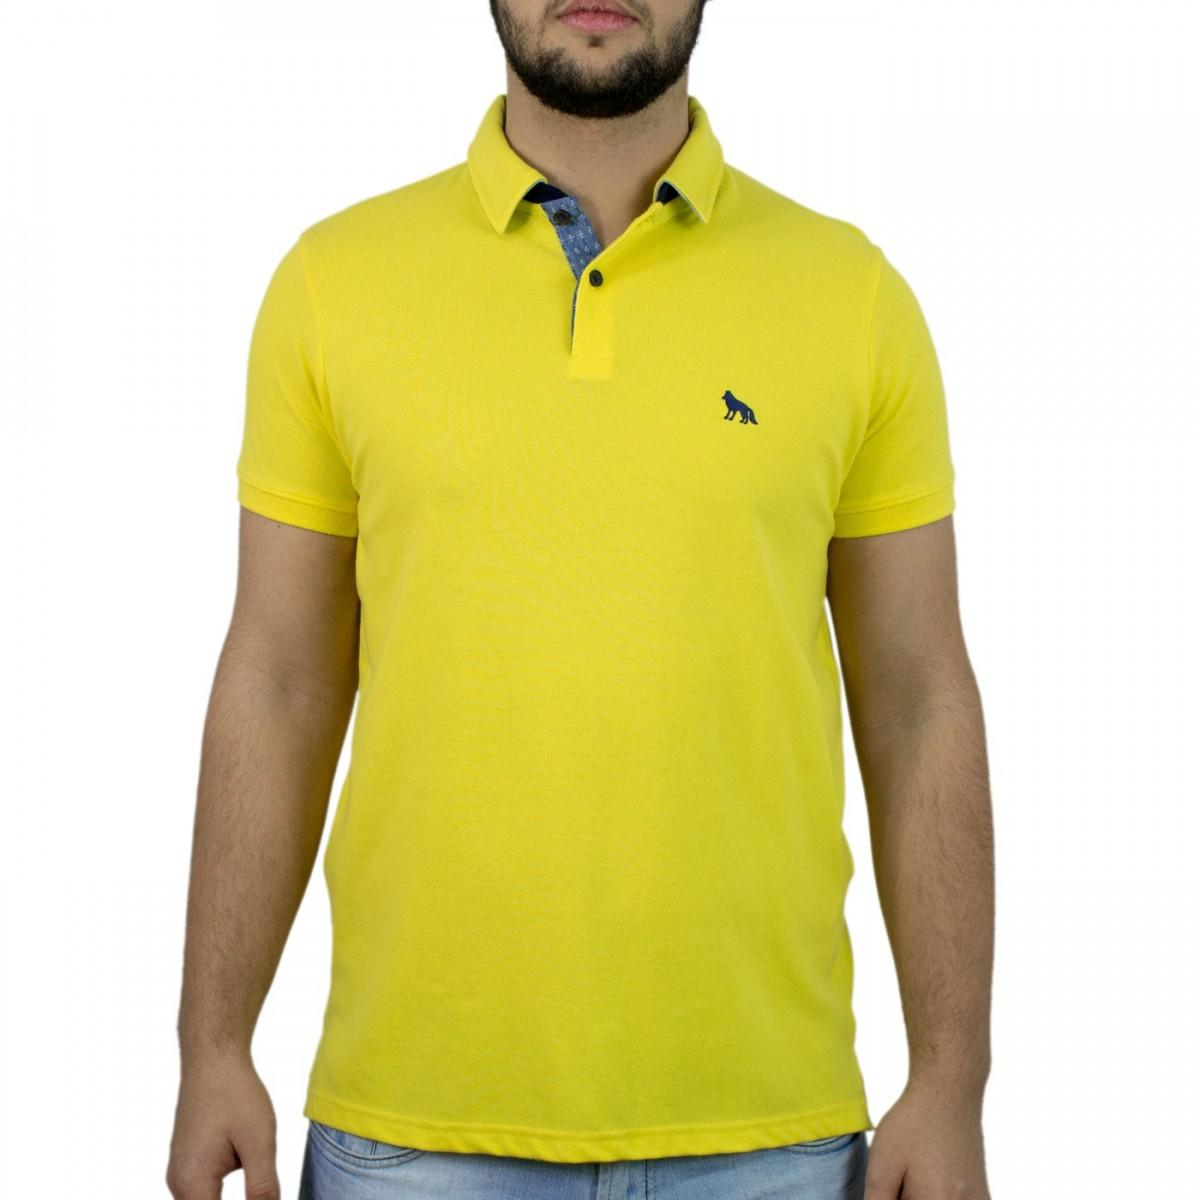 1af9eadadd Bizz Store - Camisa Polo Masculina Acostamento Manga Curta